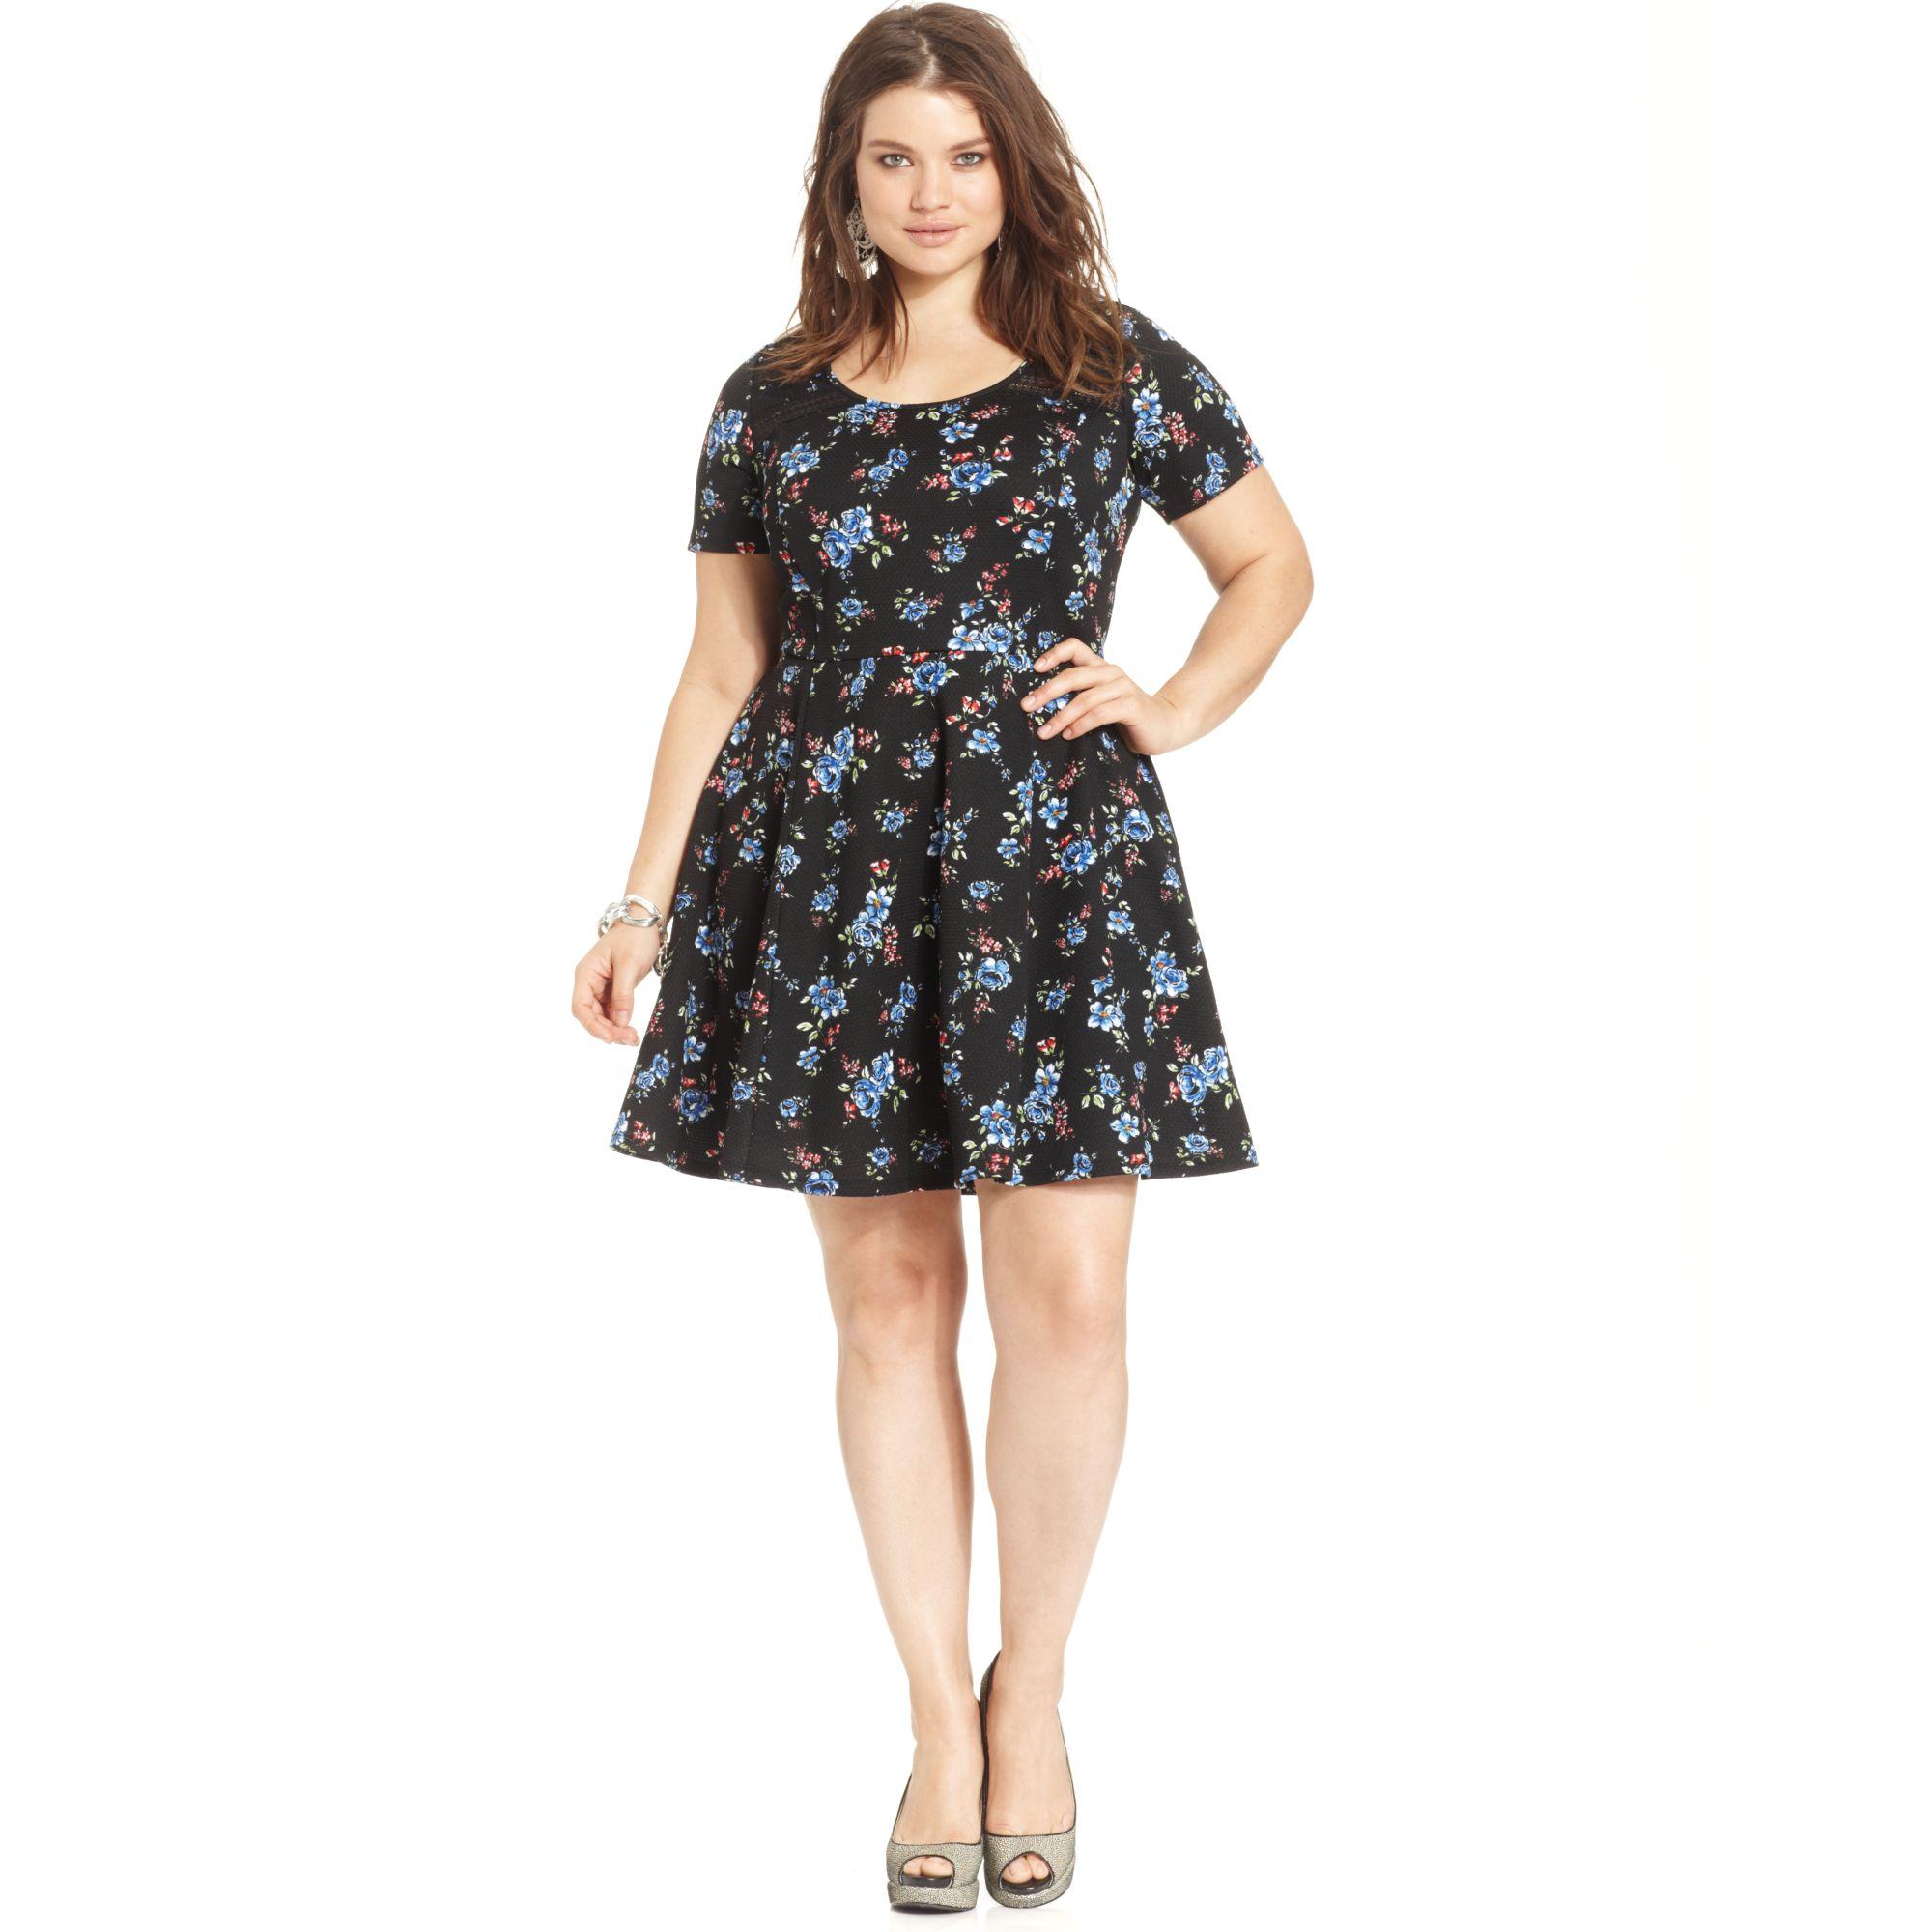 e6b1e806c593fa Lyst - Jessica Simpson Plus Size Short Sleeve Floral Print Dress